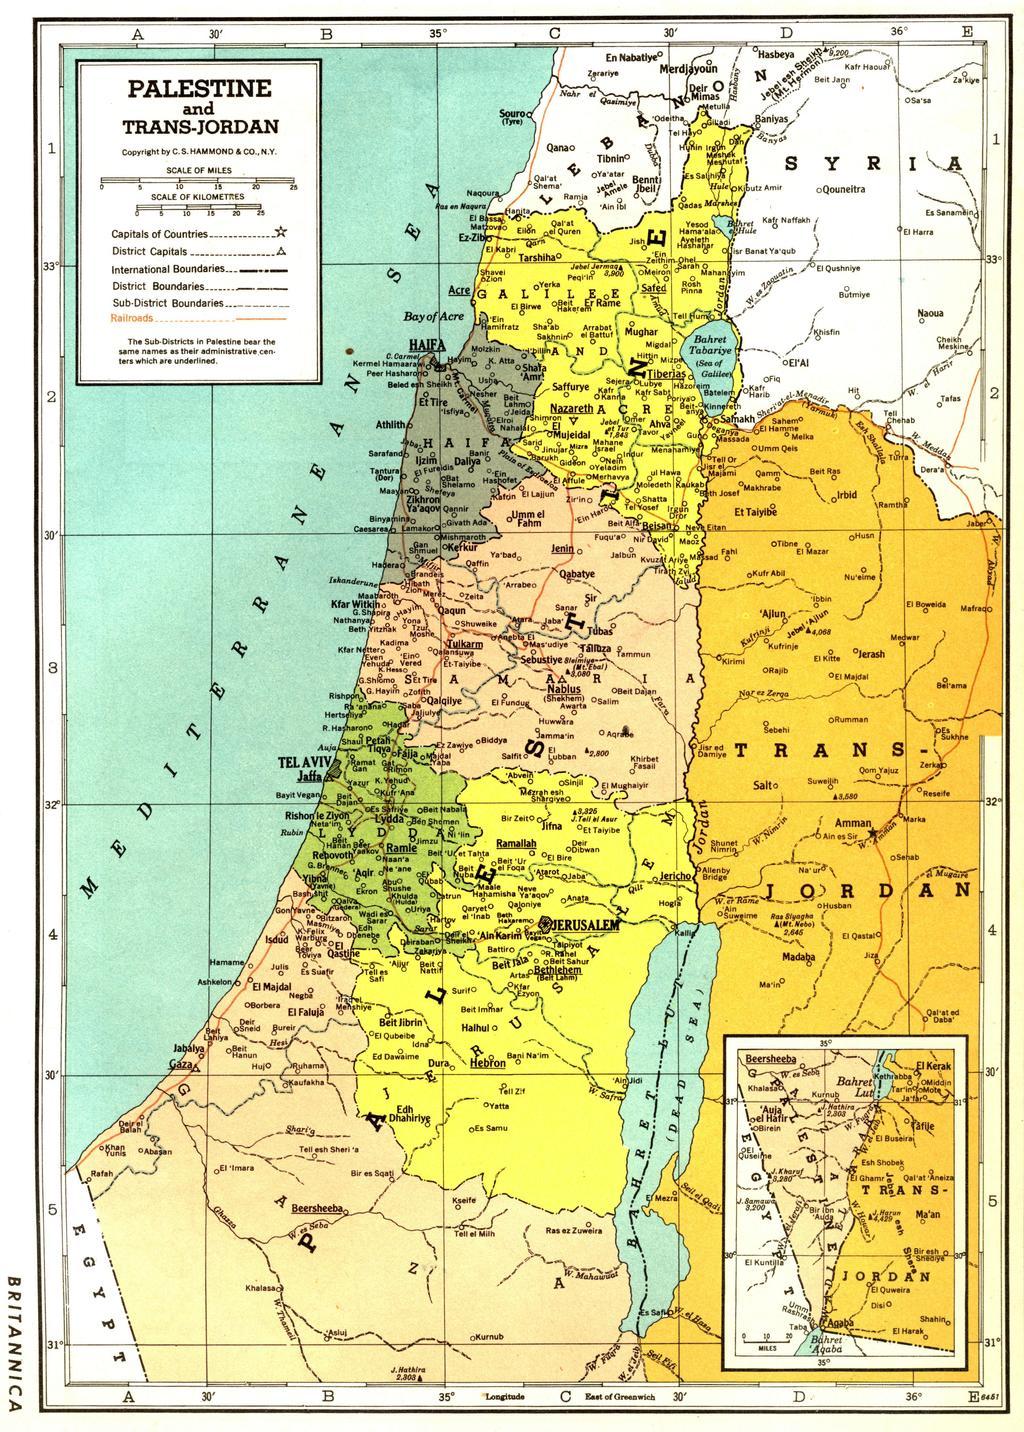 Map of Palestine c. 1922